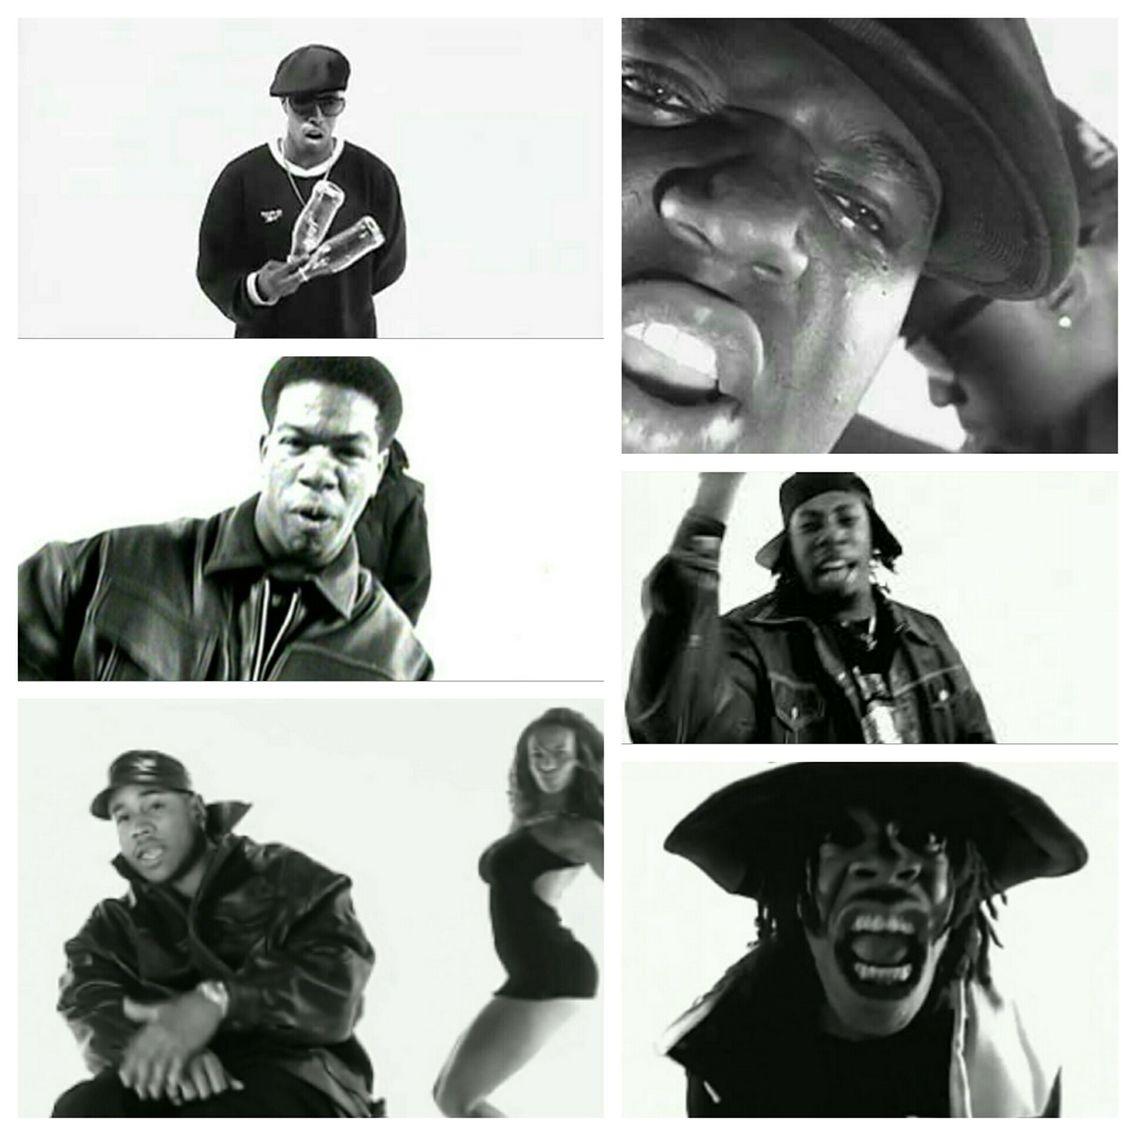 Flava in ya ear remix | I ❤ Hip Hop!!!! | Pinterest | Hip hop